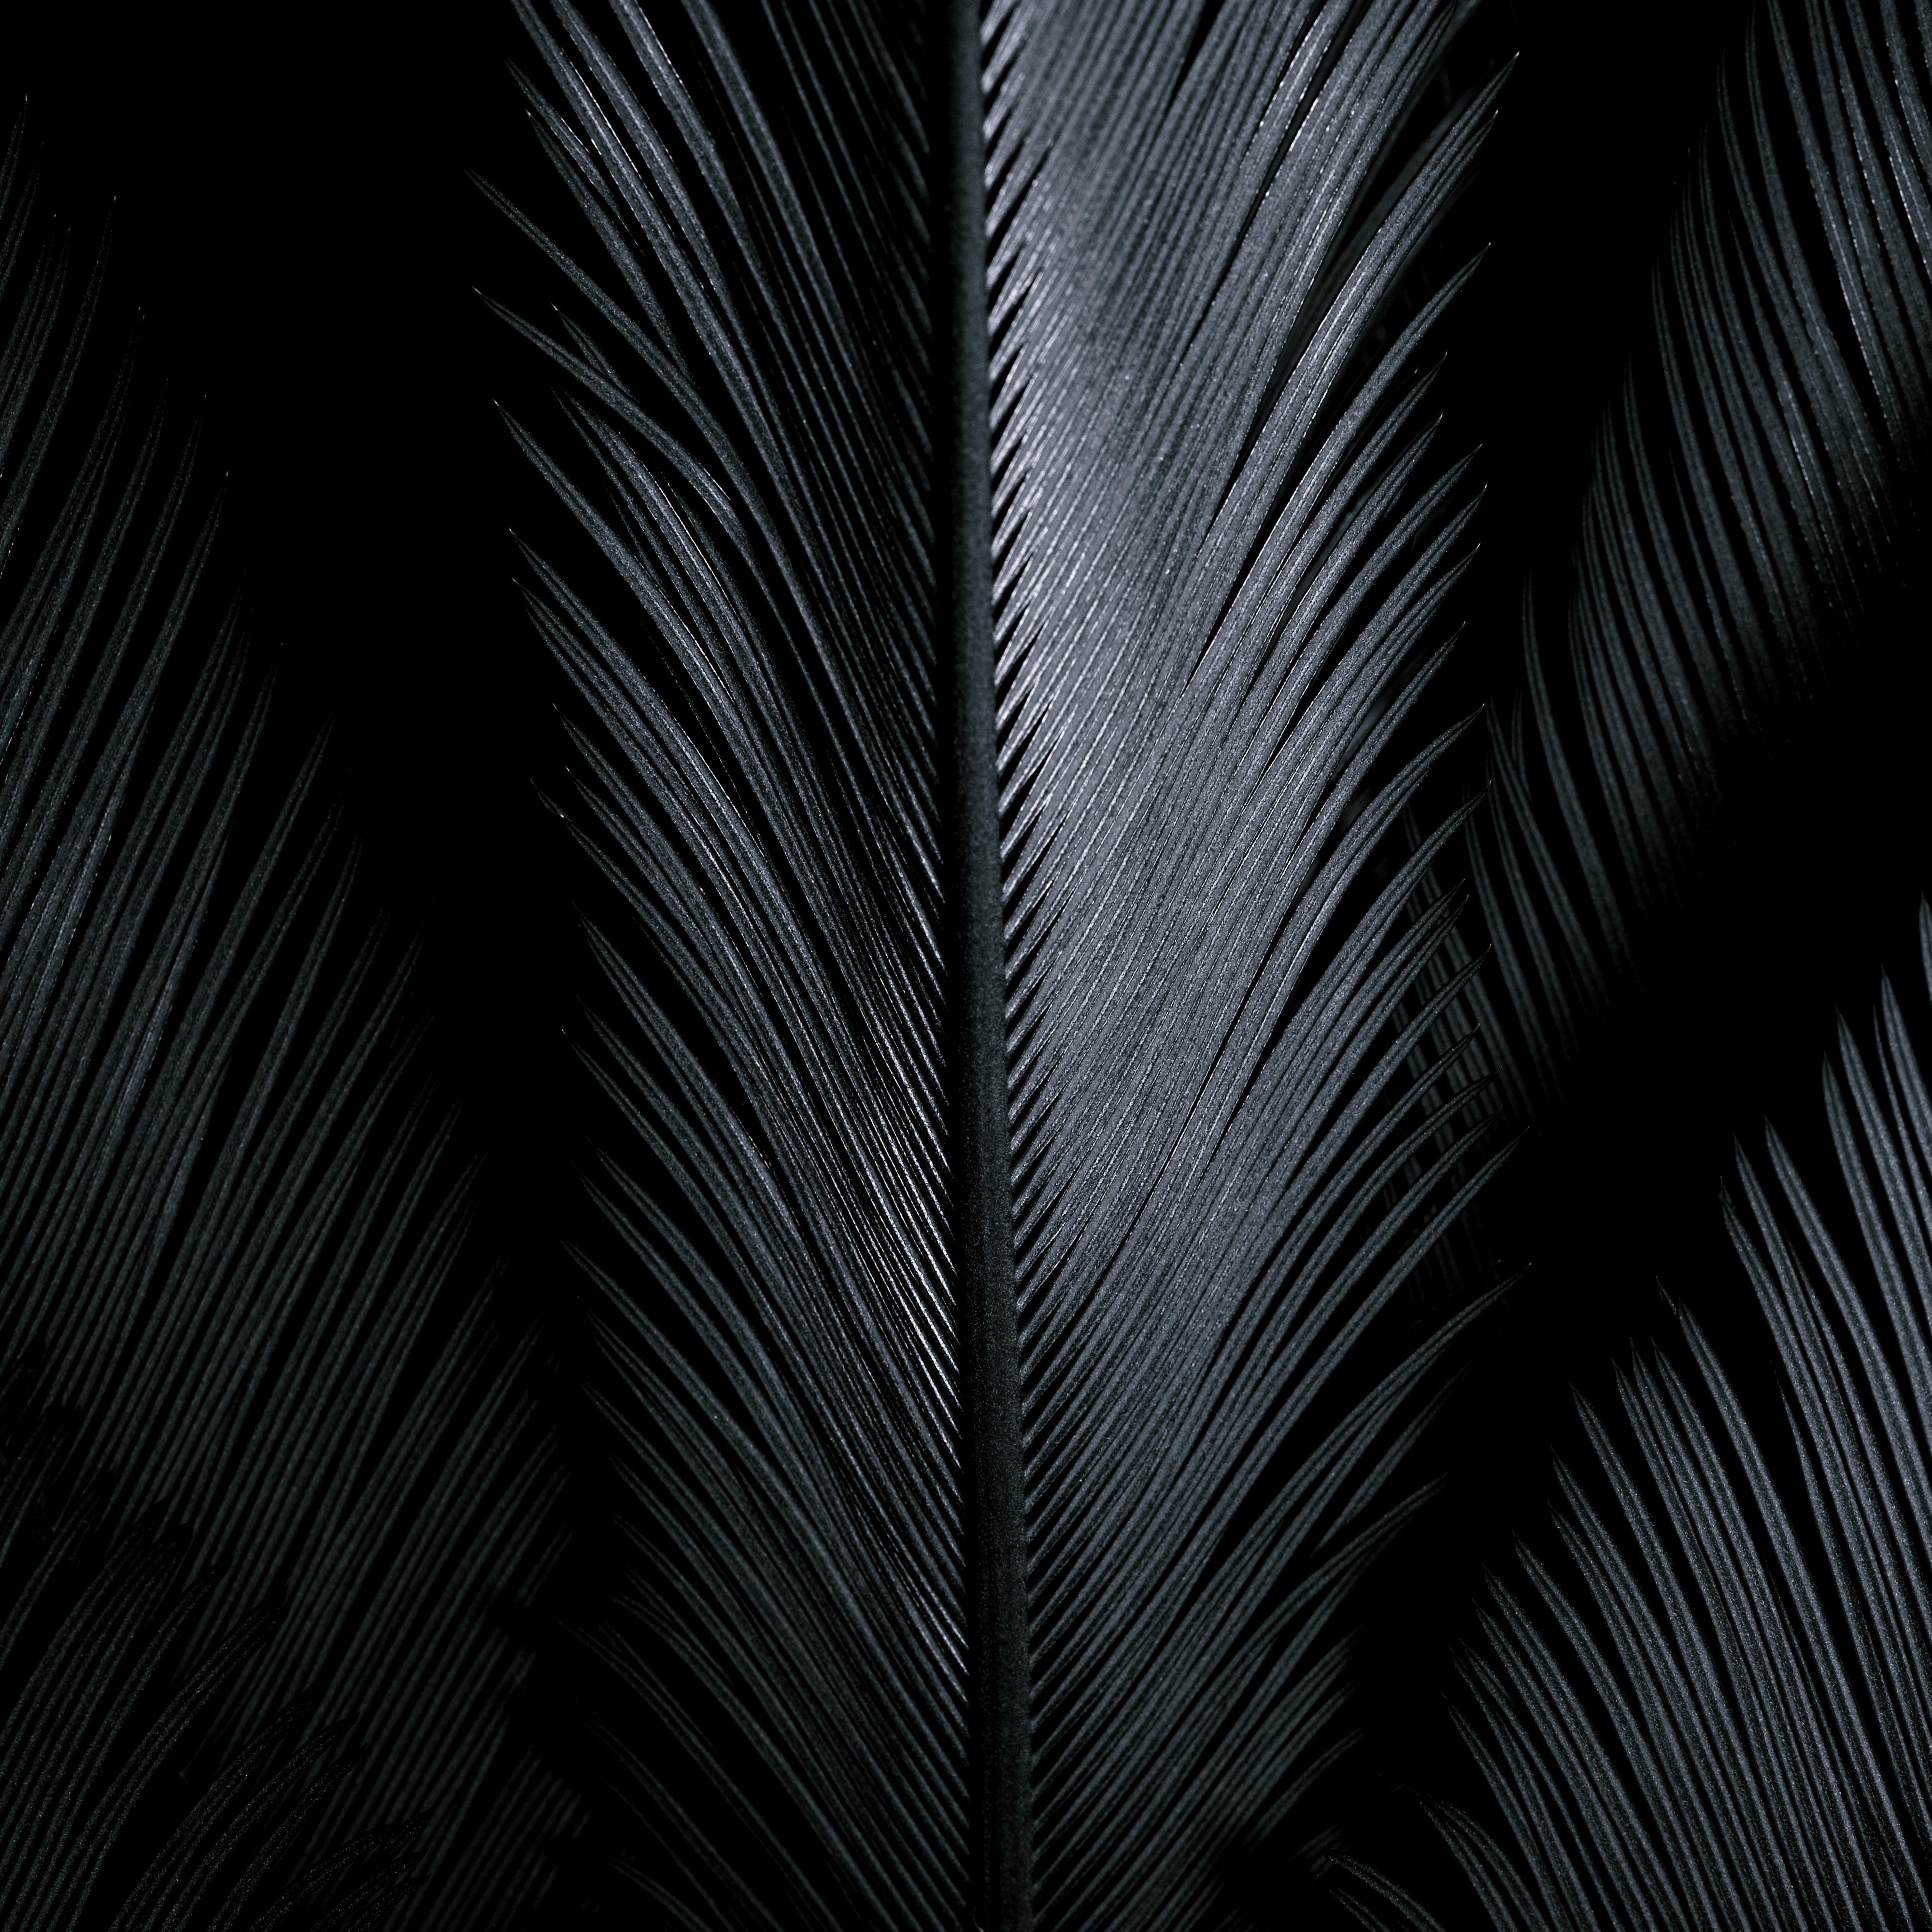 Gray Shiny Feathers On Black Background Free Stock Photo